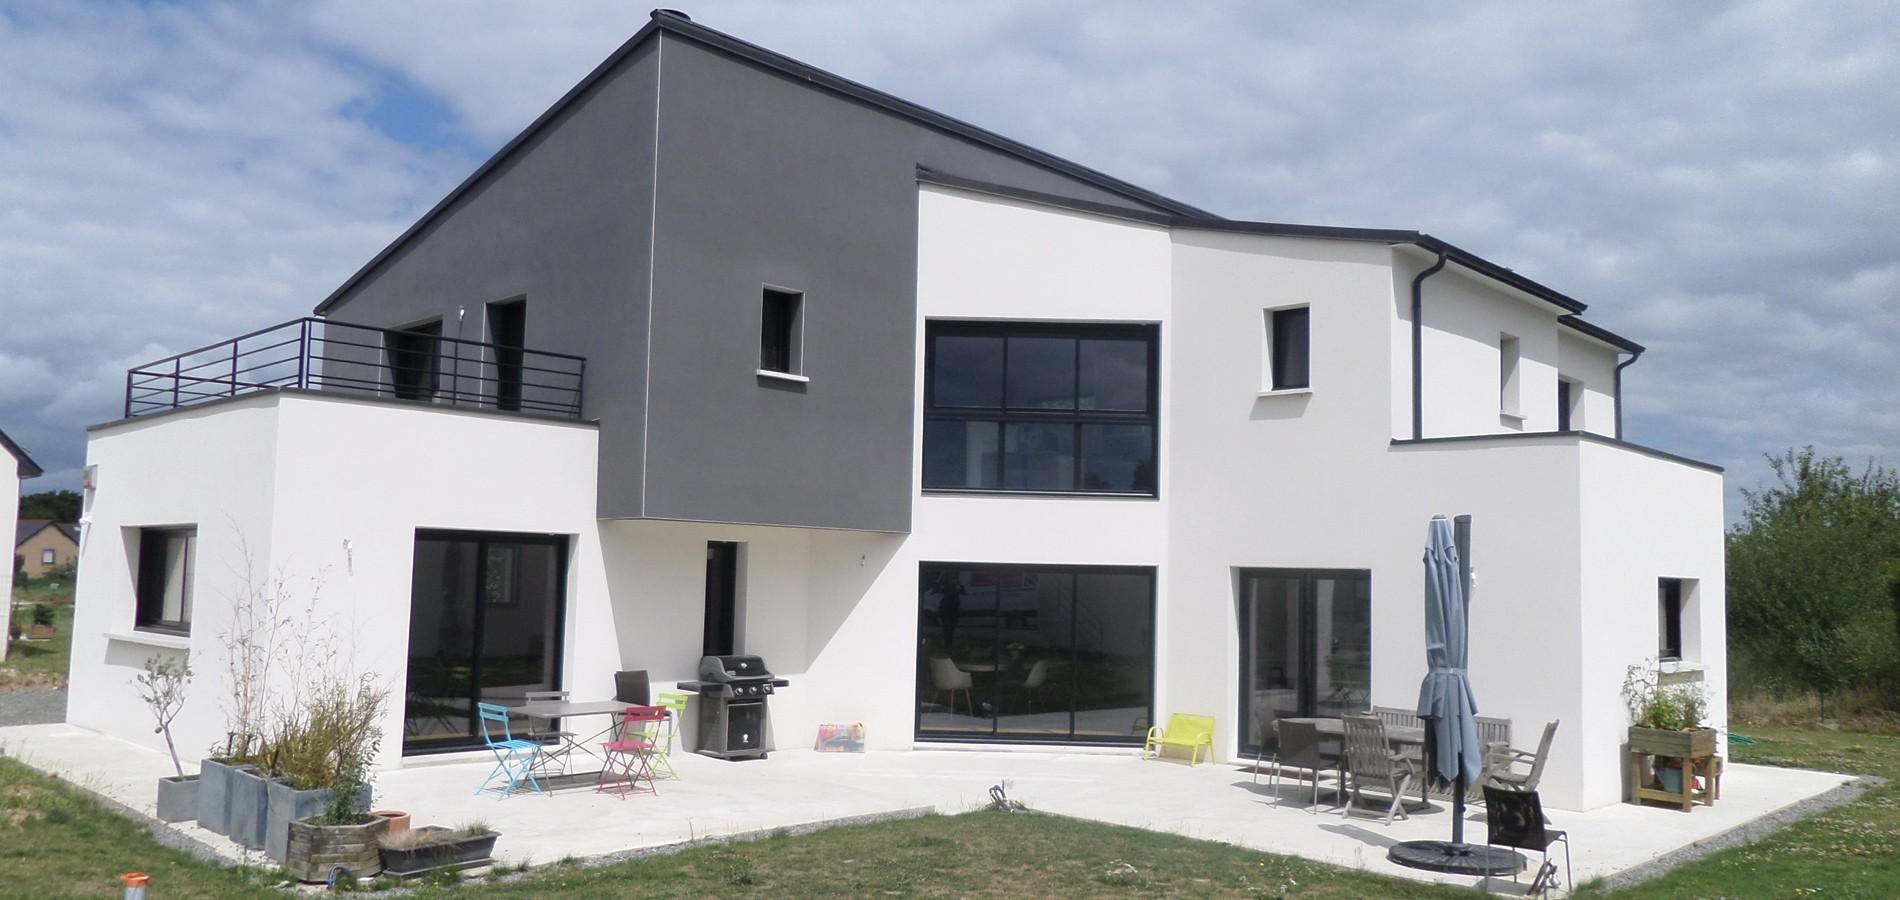 Mezzanine bruno jouanny architecte for Maison contemporaine toit monopente